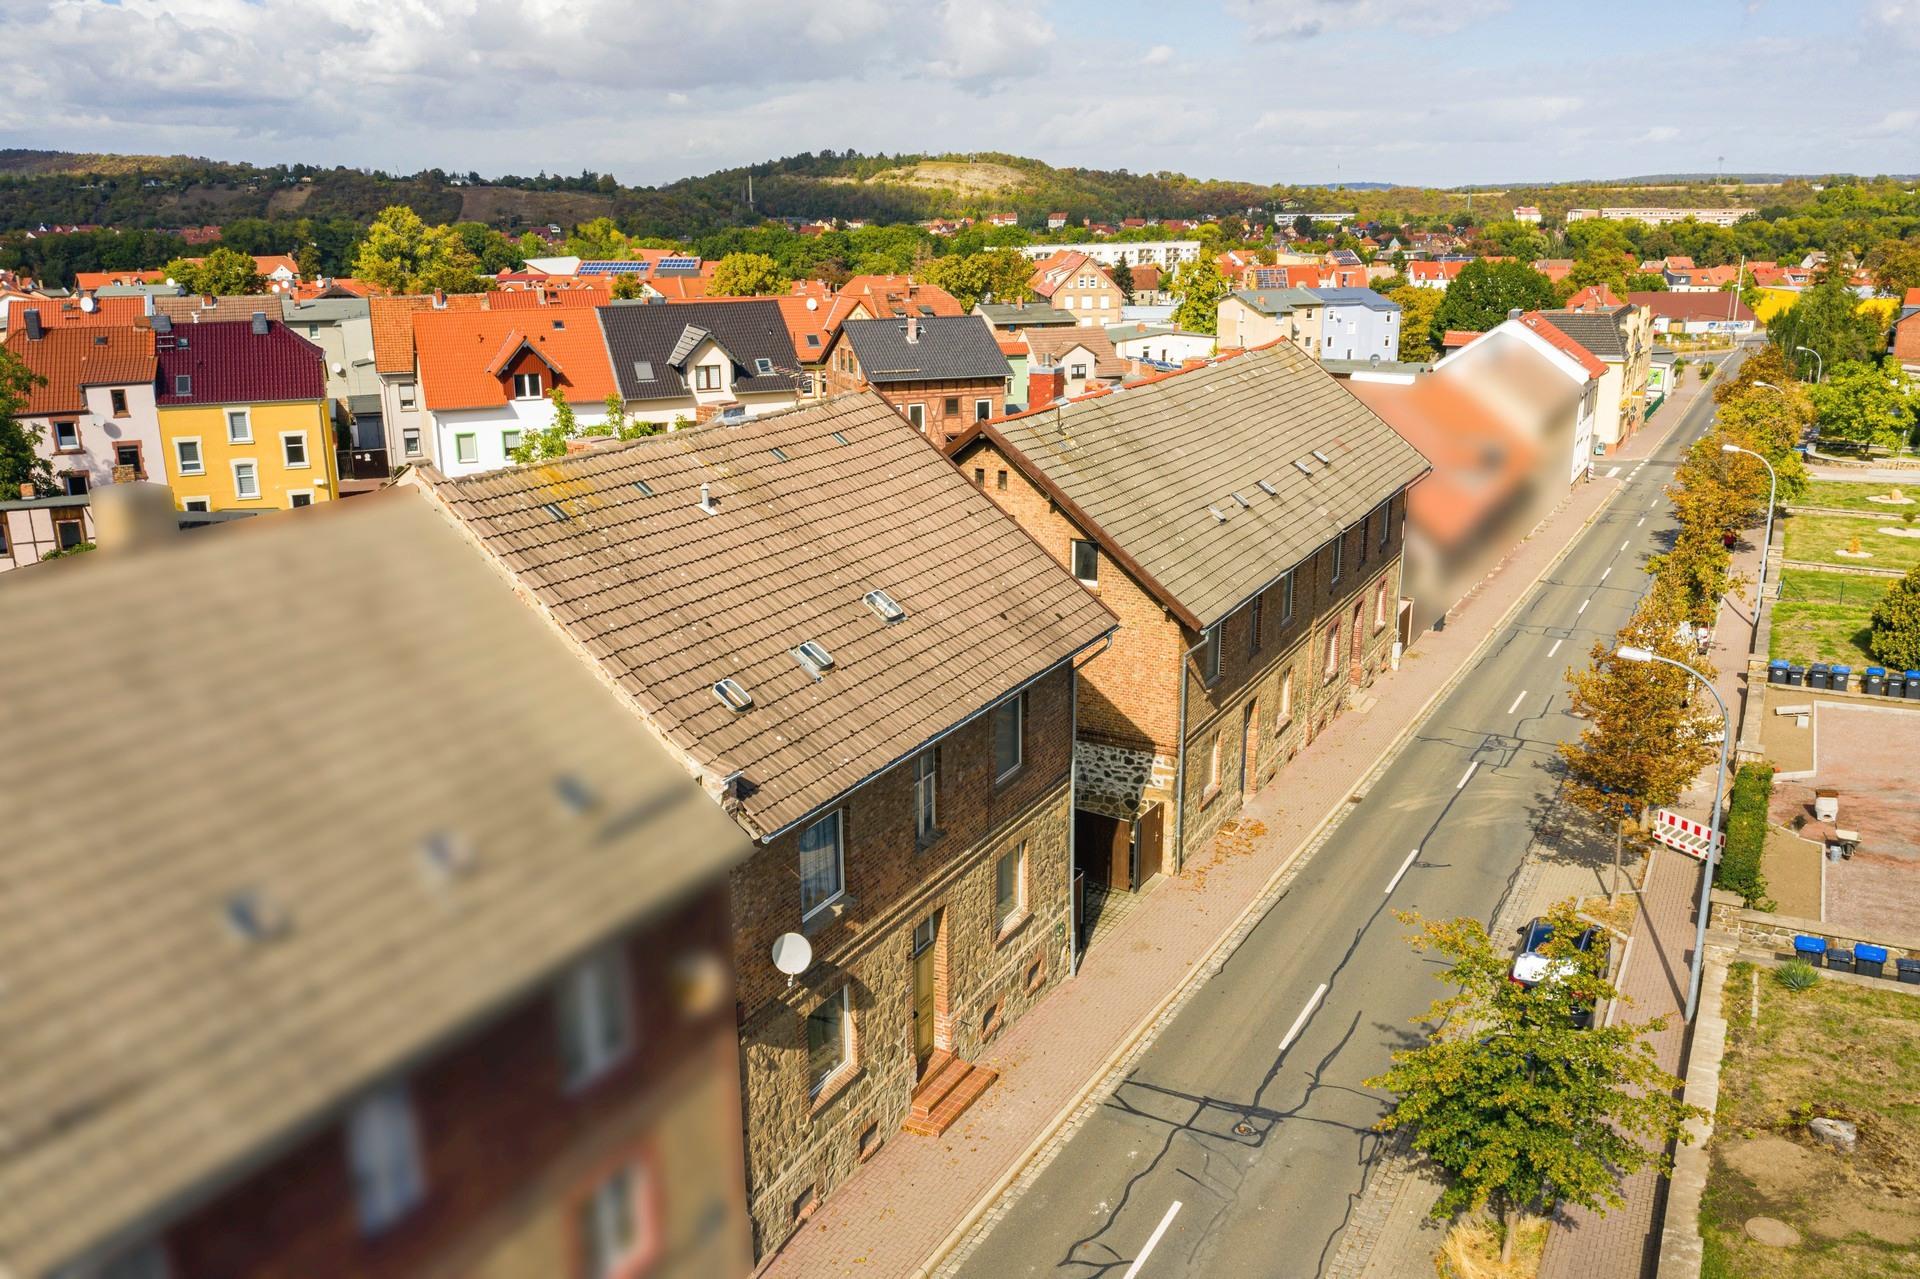 Luftbild Immobilie Drohne